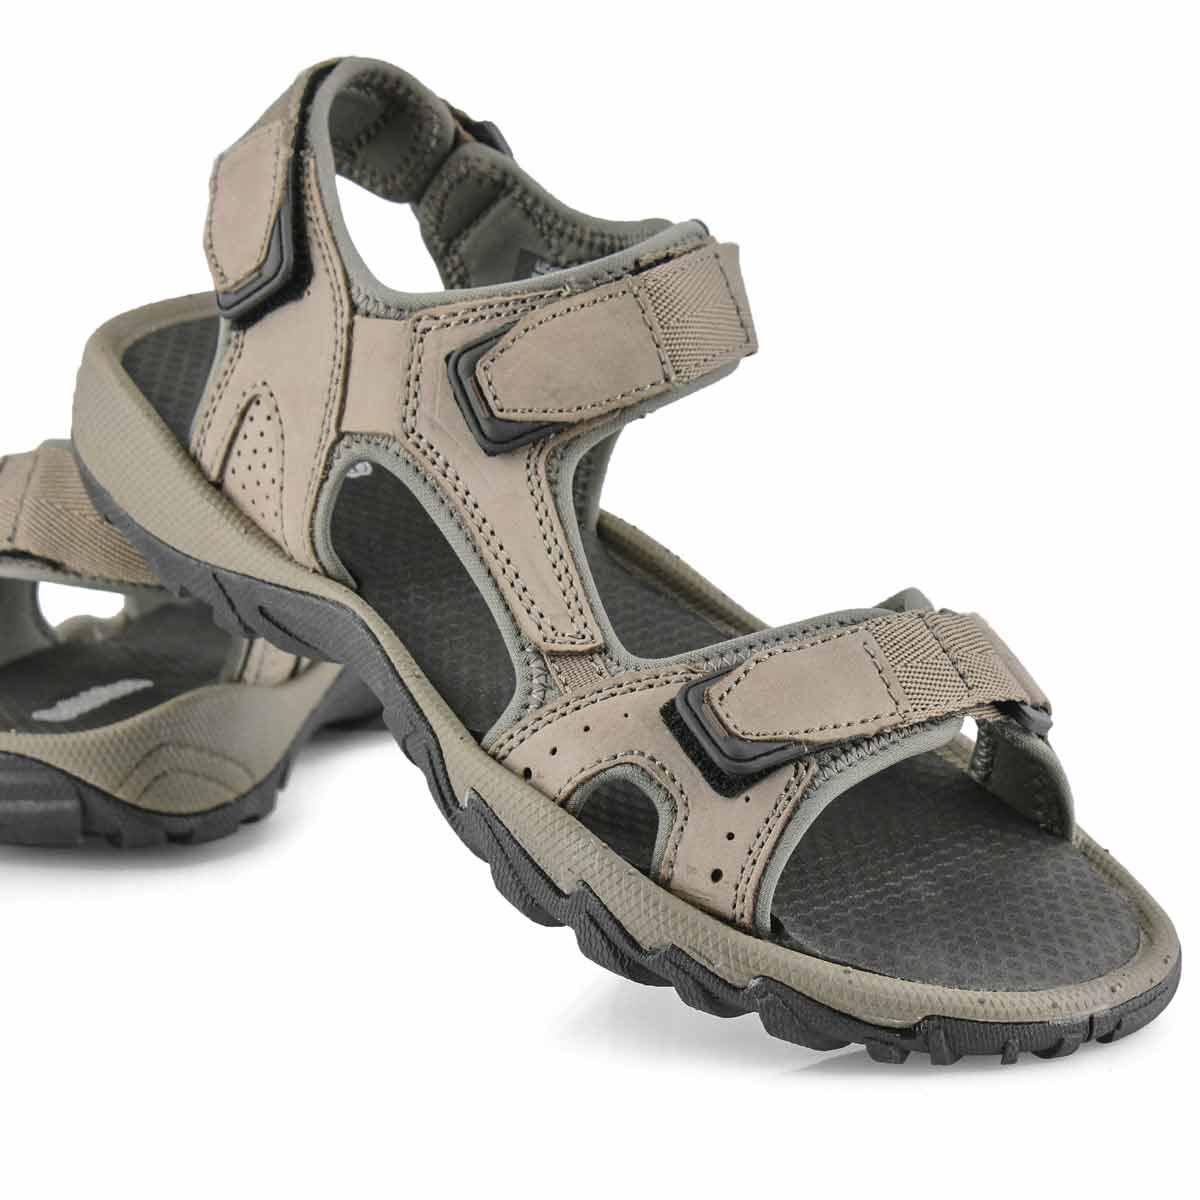 Mns Lucius 4 grey 3 strap sport sandal